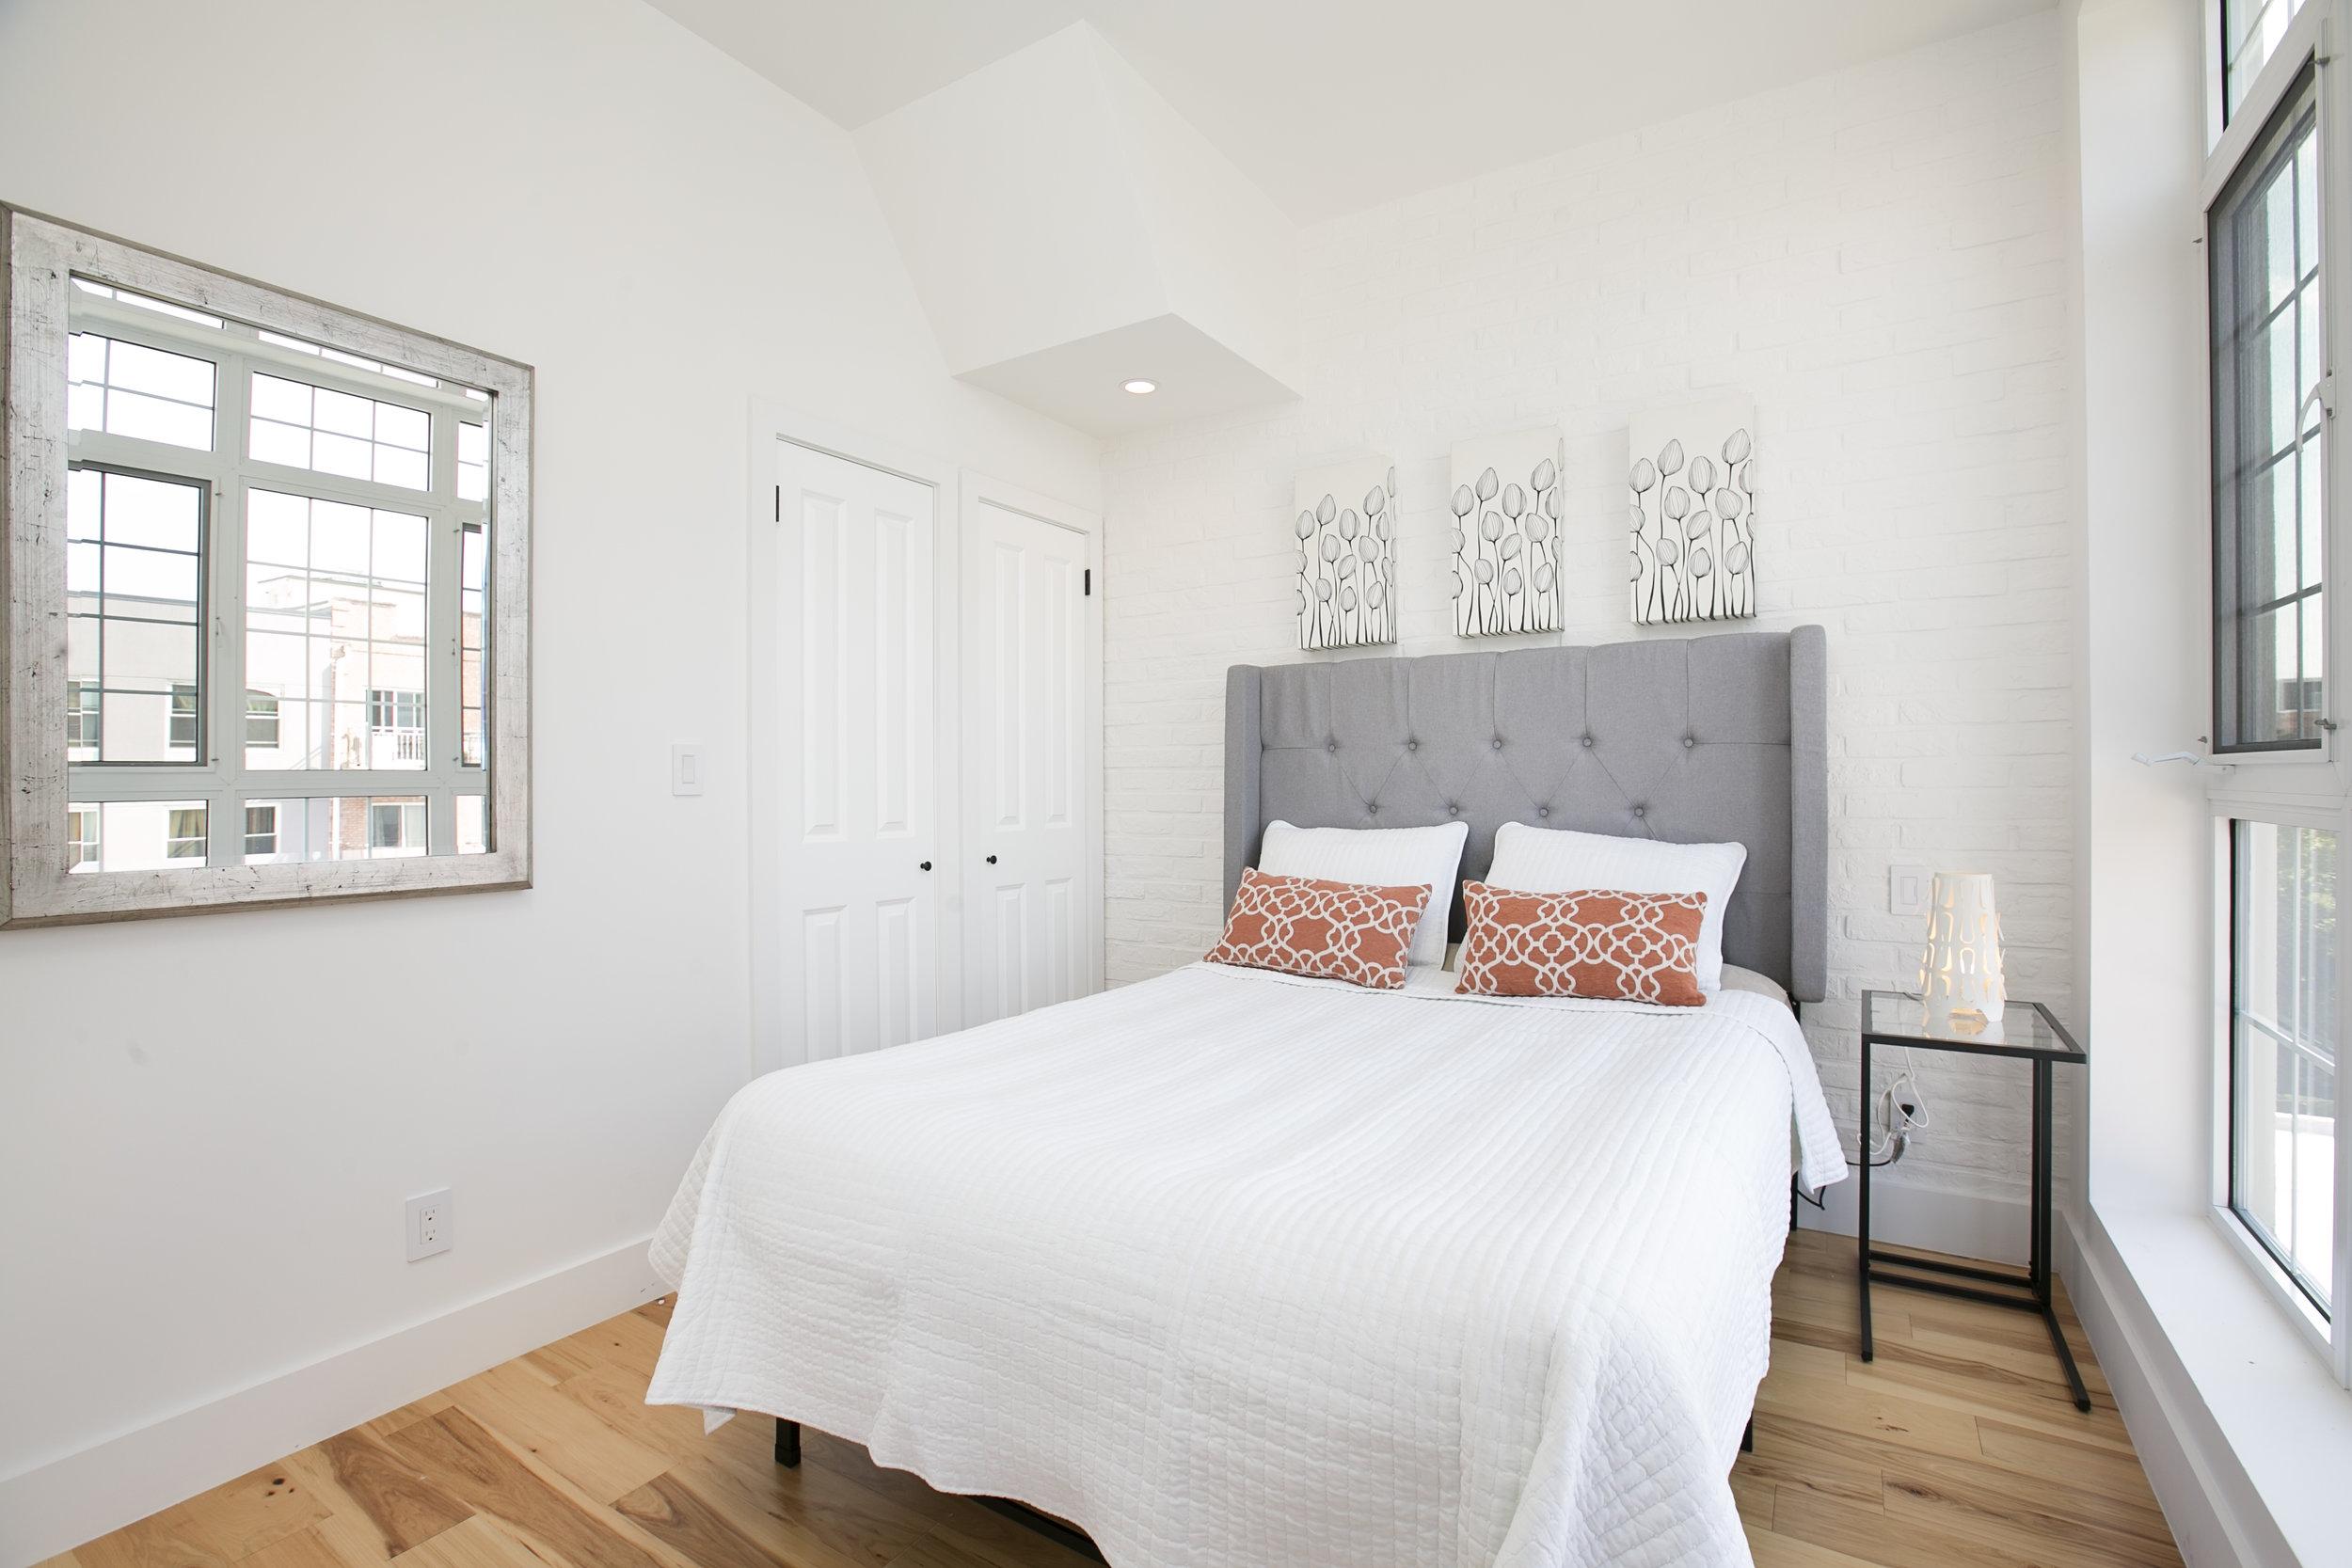 4B bed1.jpg